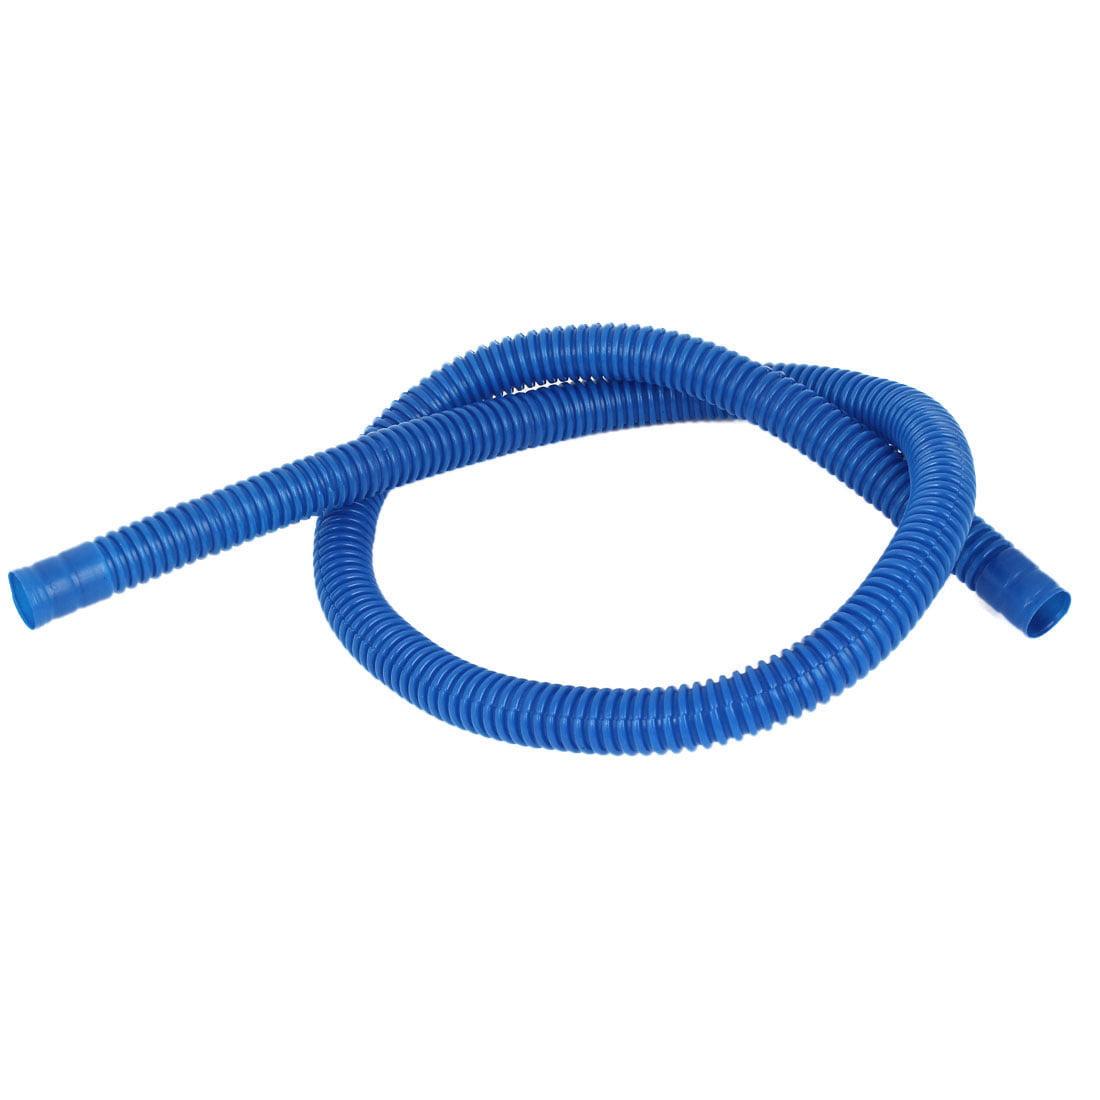 "Unique Bargains Blue Flexible Washing Machine Washer Drain Hose 85cm 47"" Length"